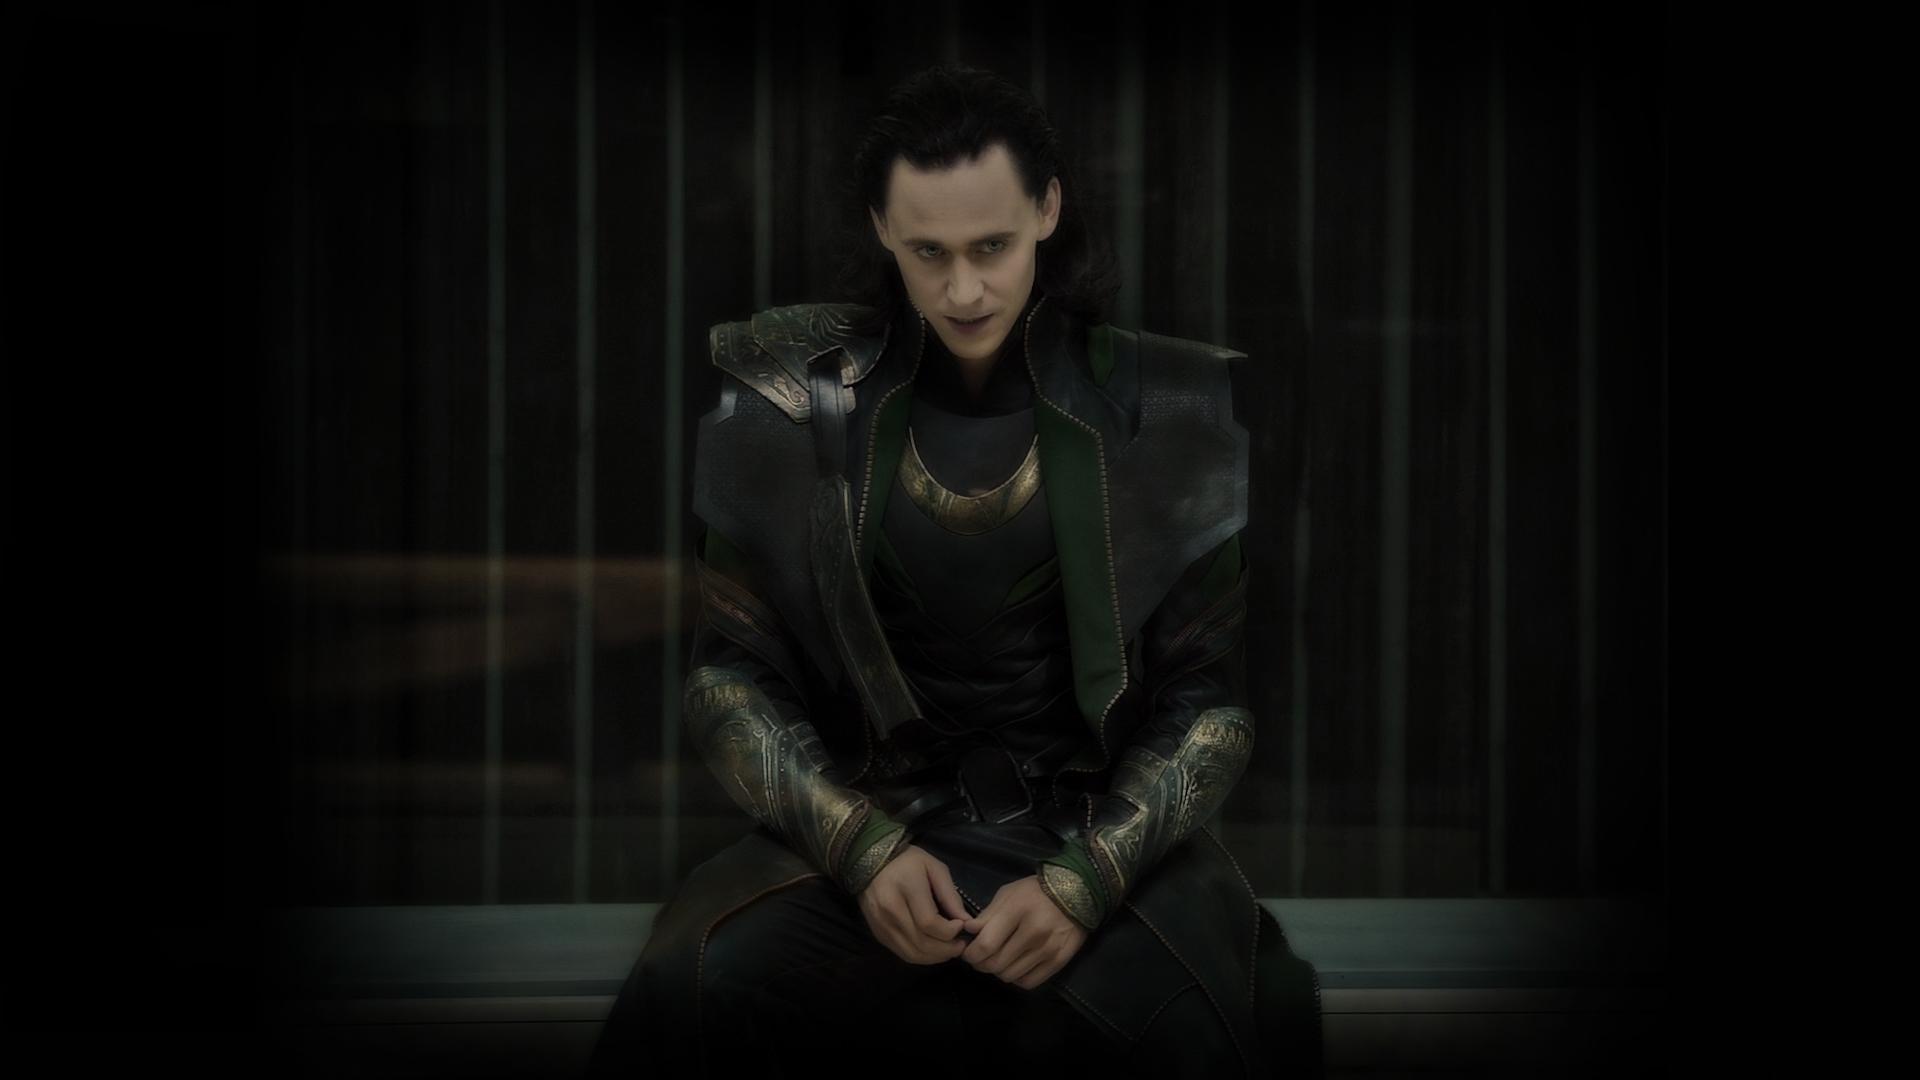 Hd Wallpapers Joker Quotes Loki Hd Wallpapers Pixelstalk Net